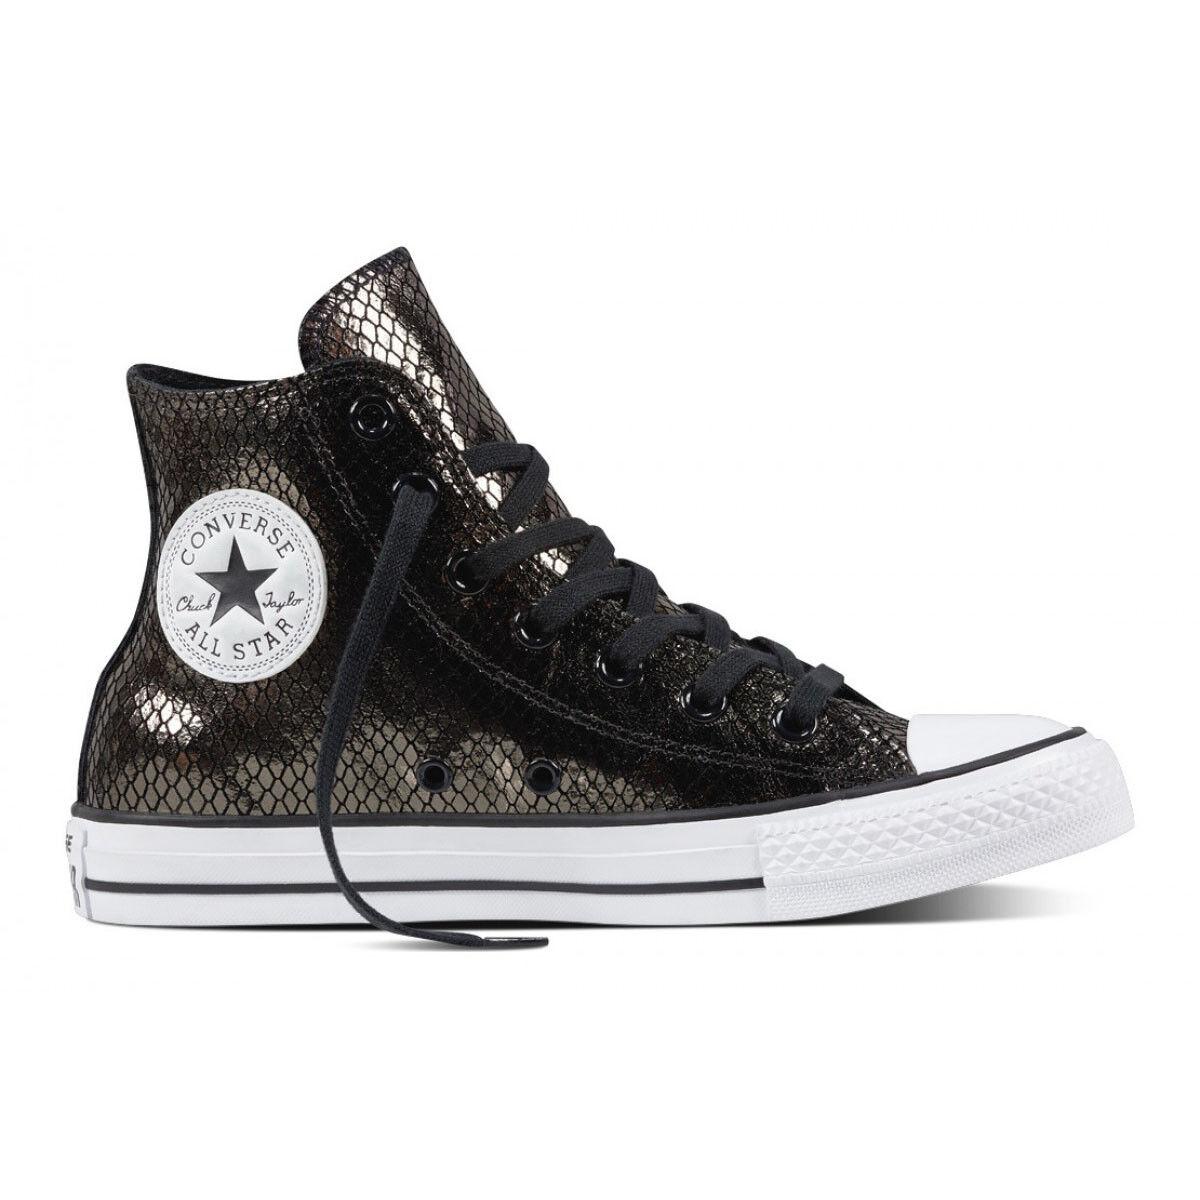 Converse Women's Chuck Taylor All Star High Black Black White Sneaker